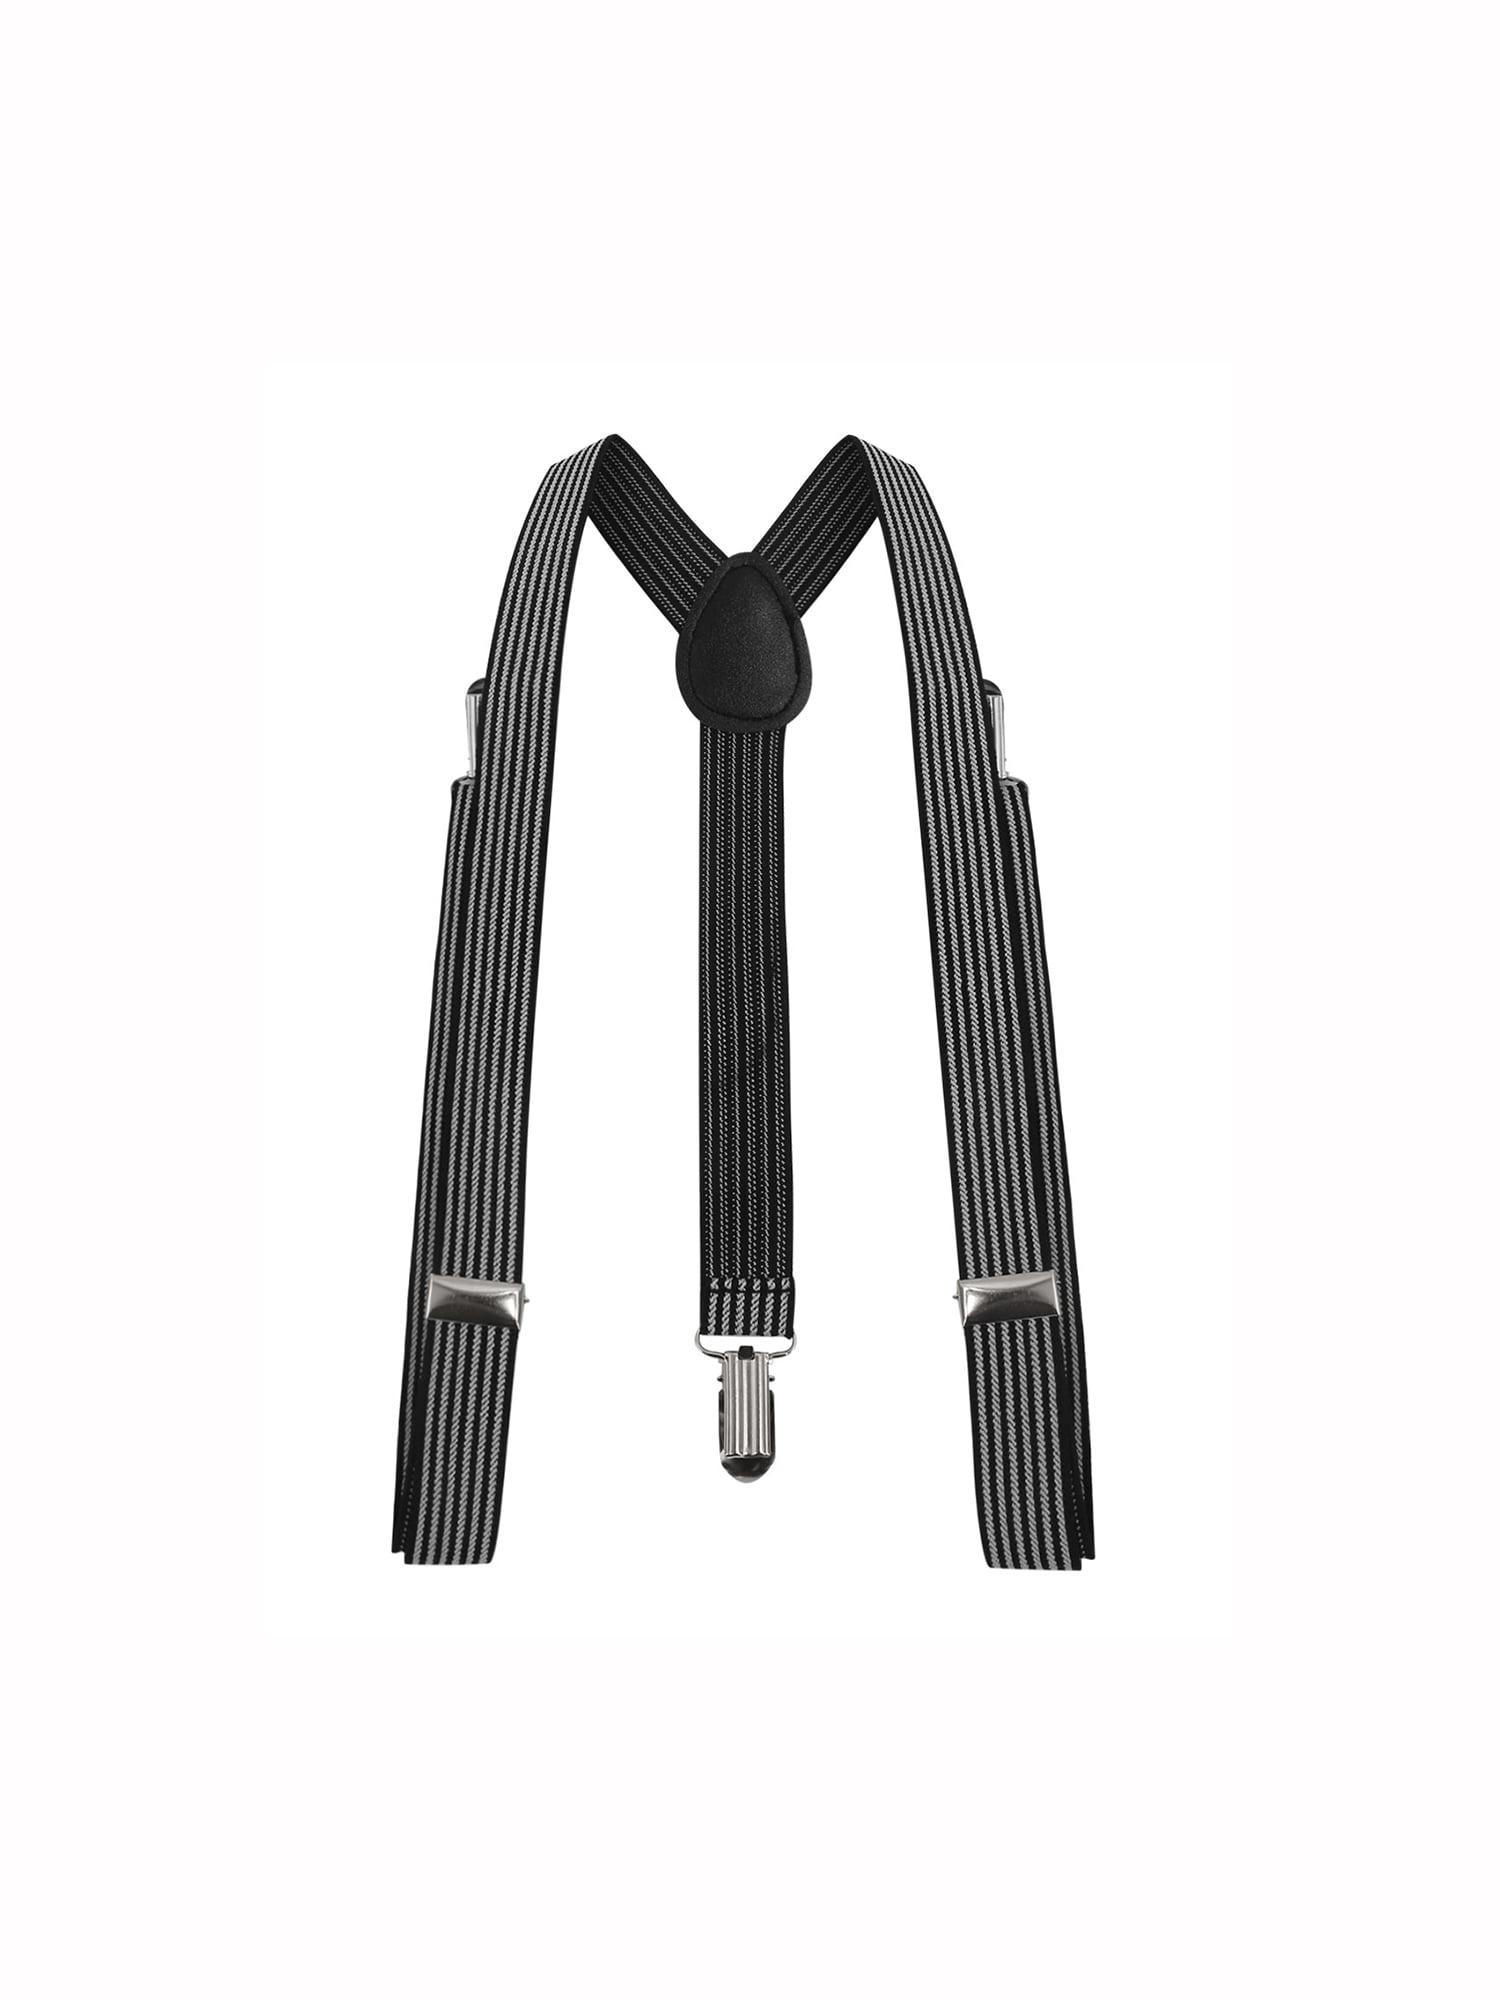 Unisex Elastic Y Shape Adjustable Leopard Prints Suspenders